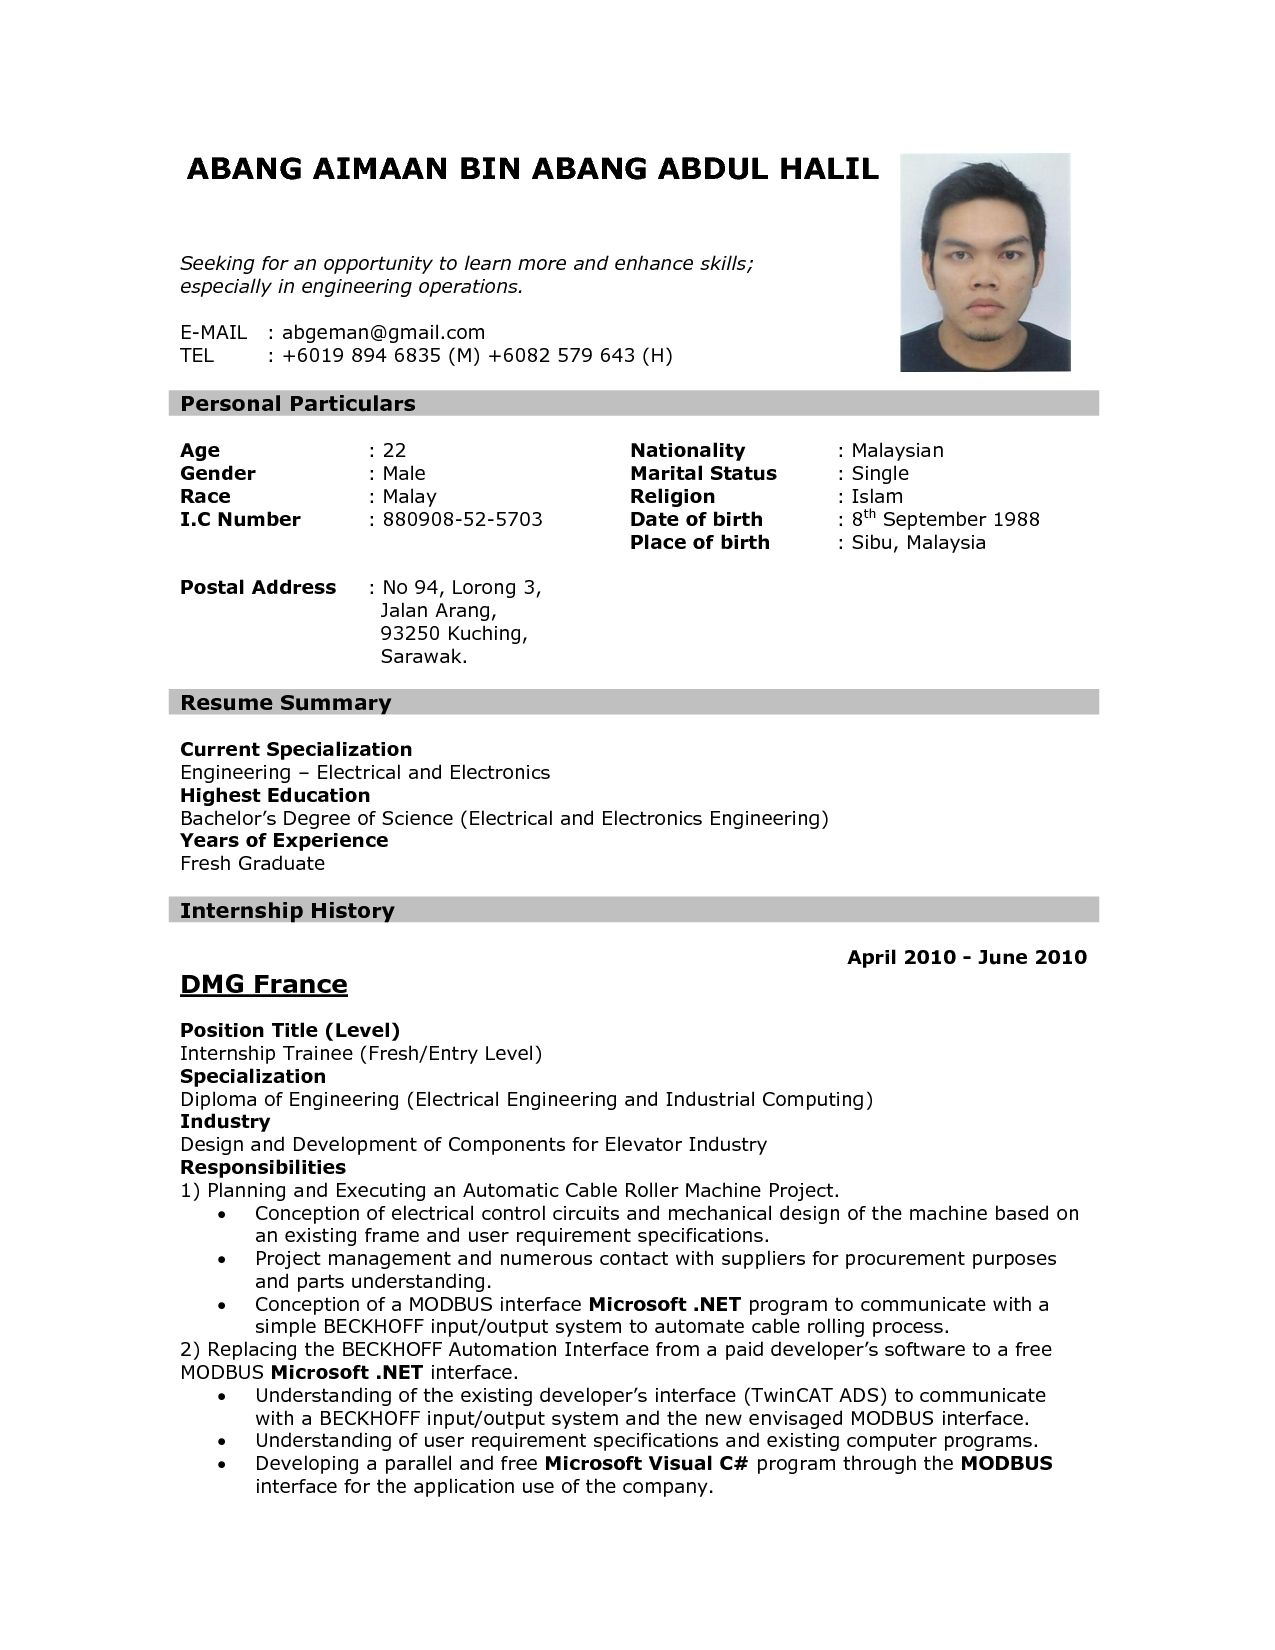 Resume Templates App resume ResumeTemplates templates